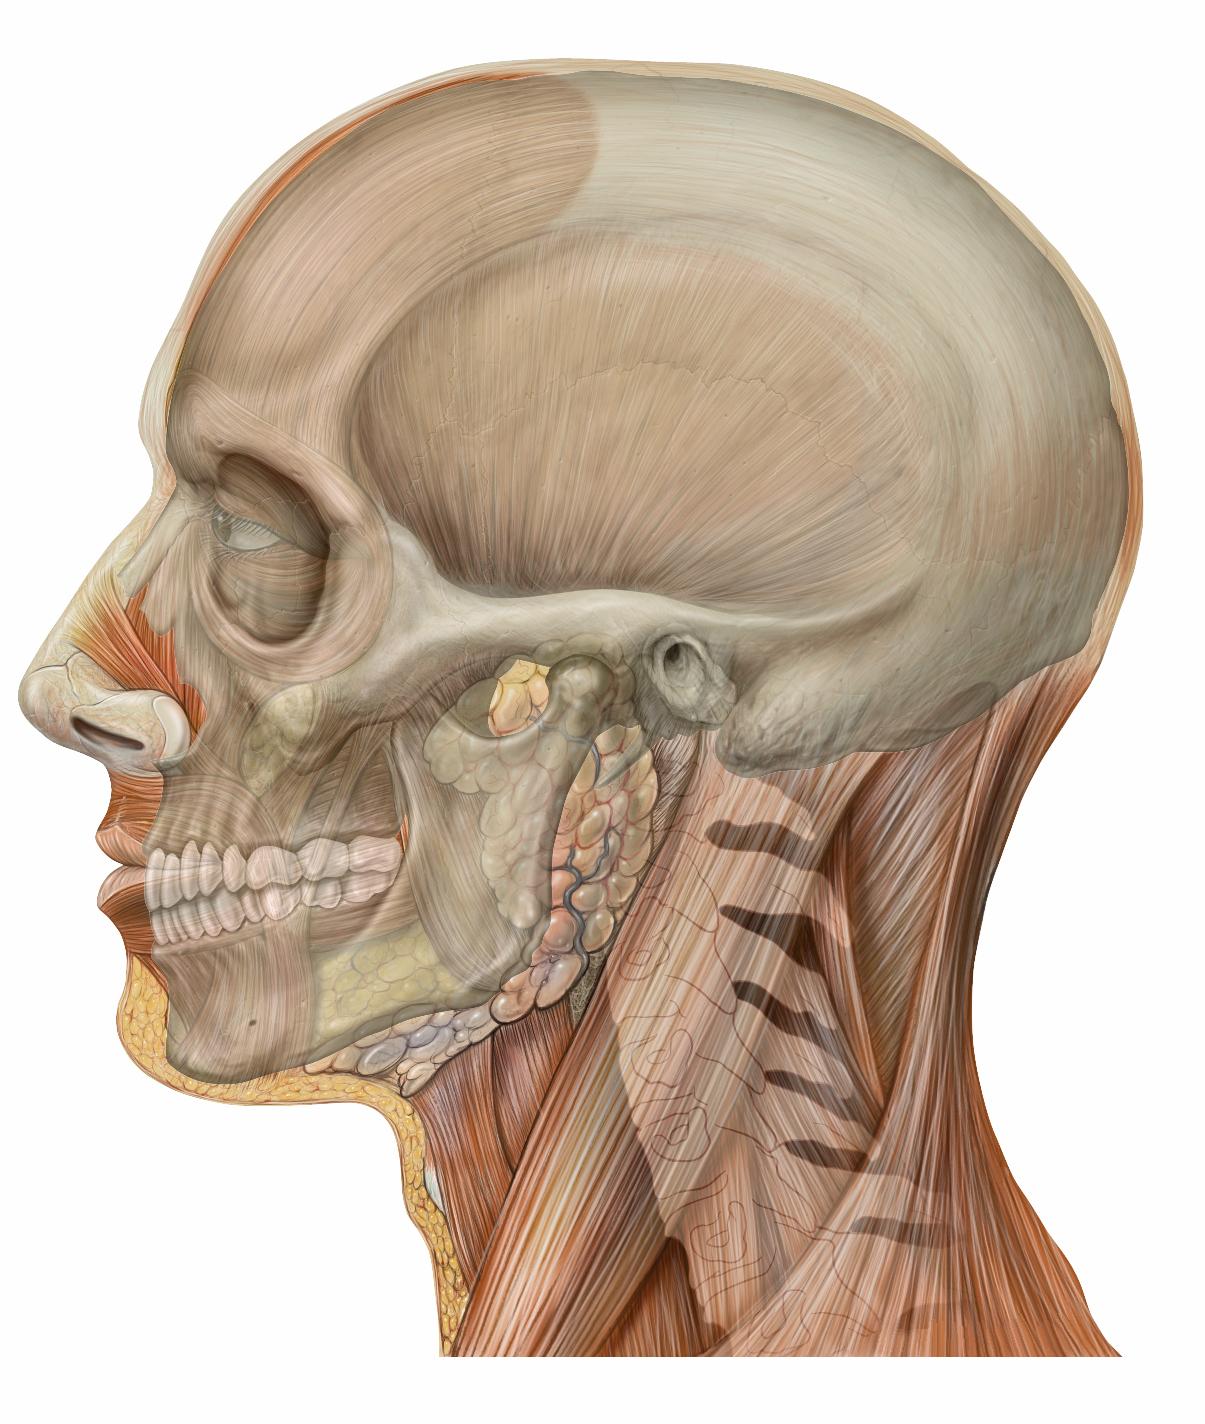 File:Lateral head skull.jpg - Wikimedia Commons